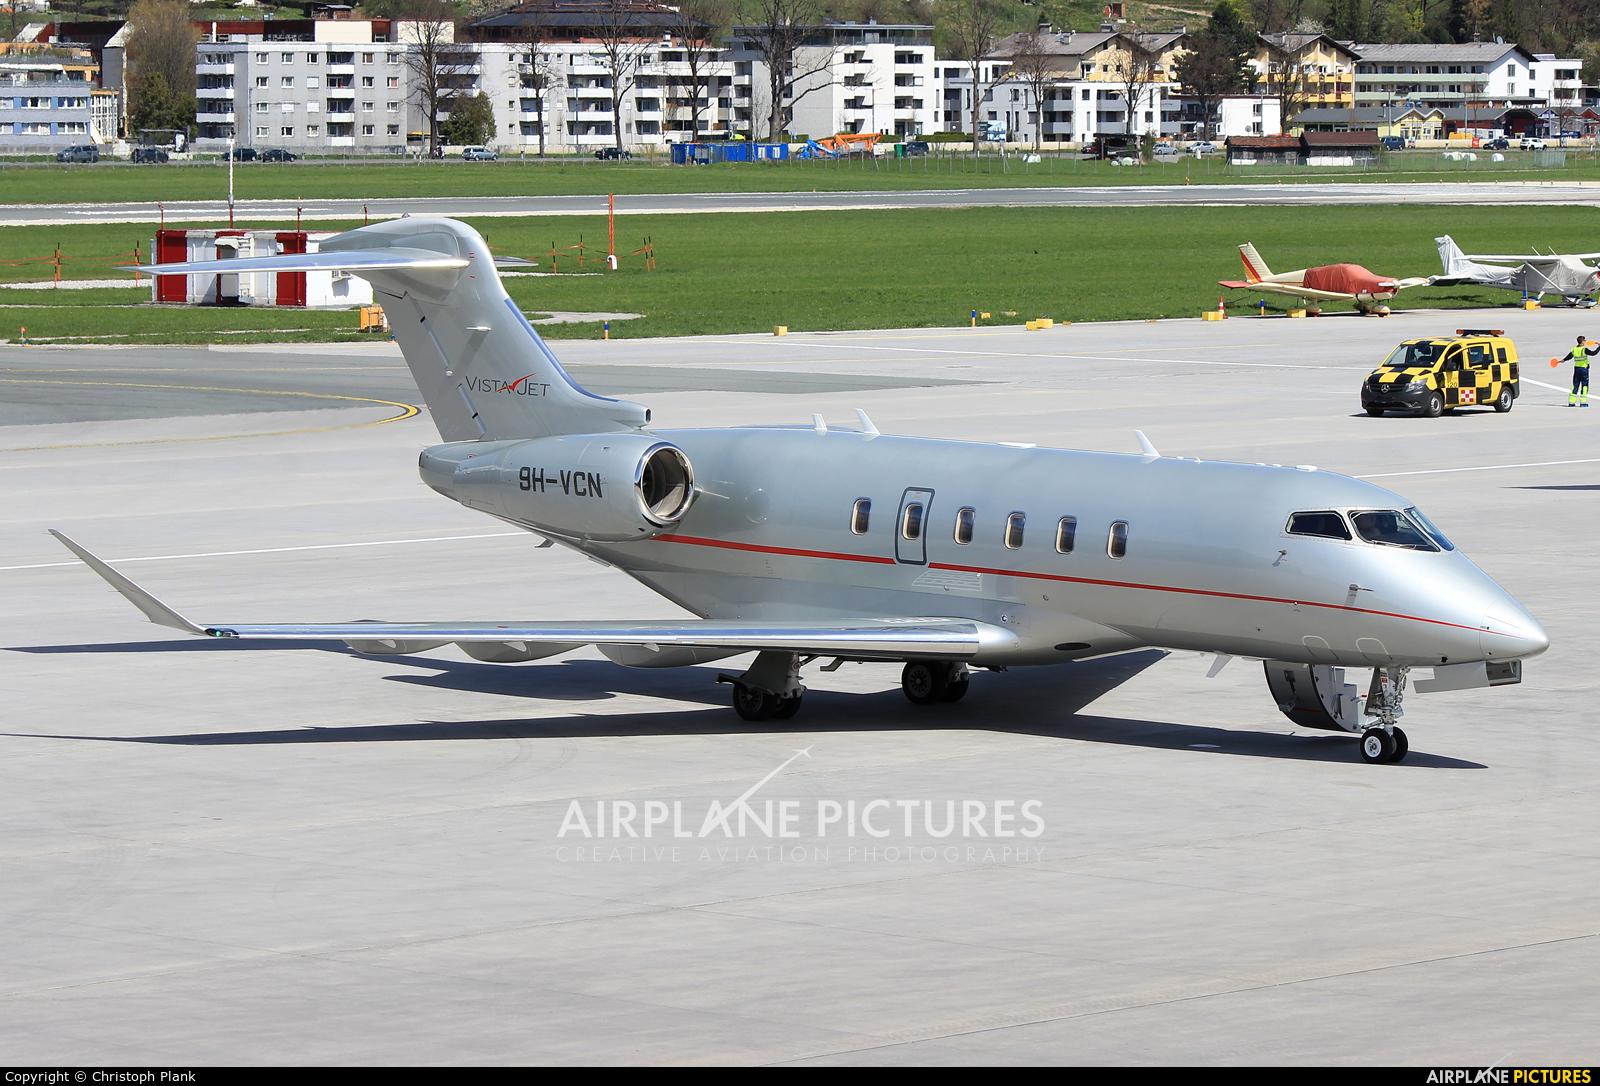 Vistajet 9H-VCN aircraft at Innsbruck